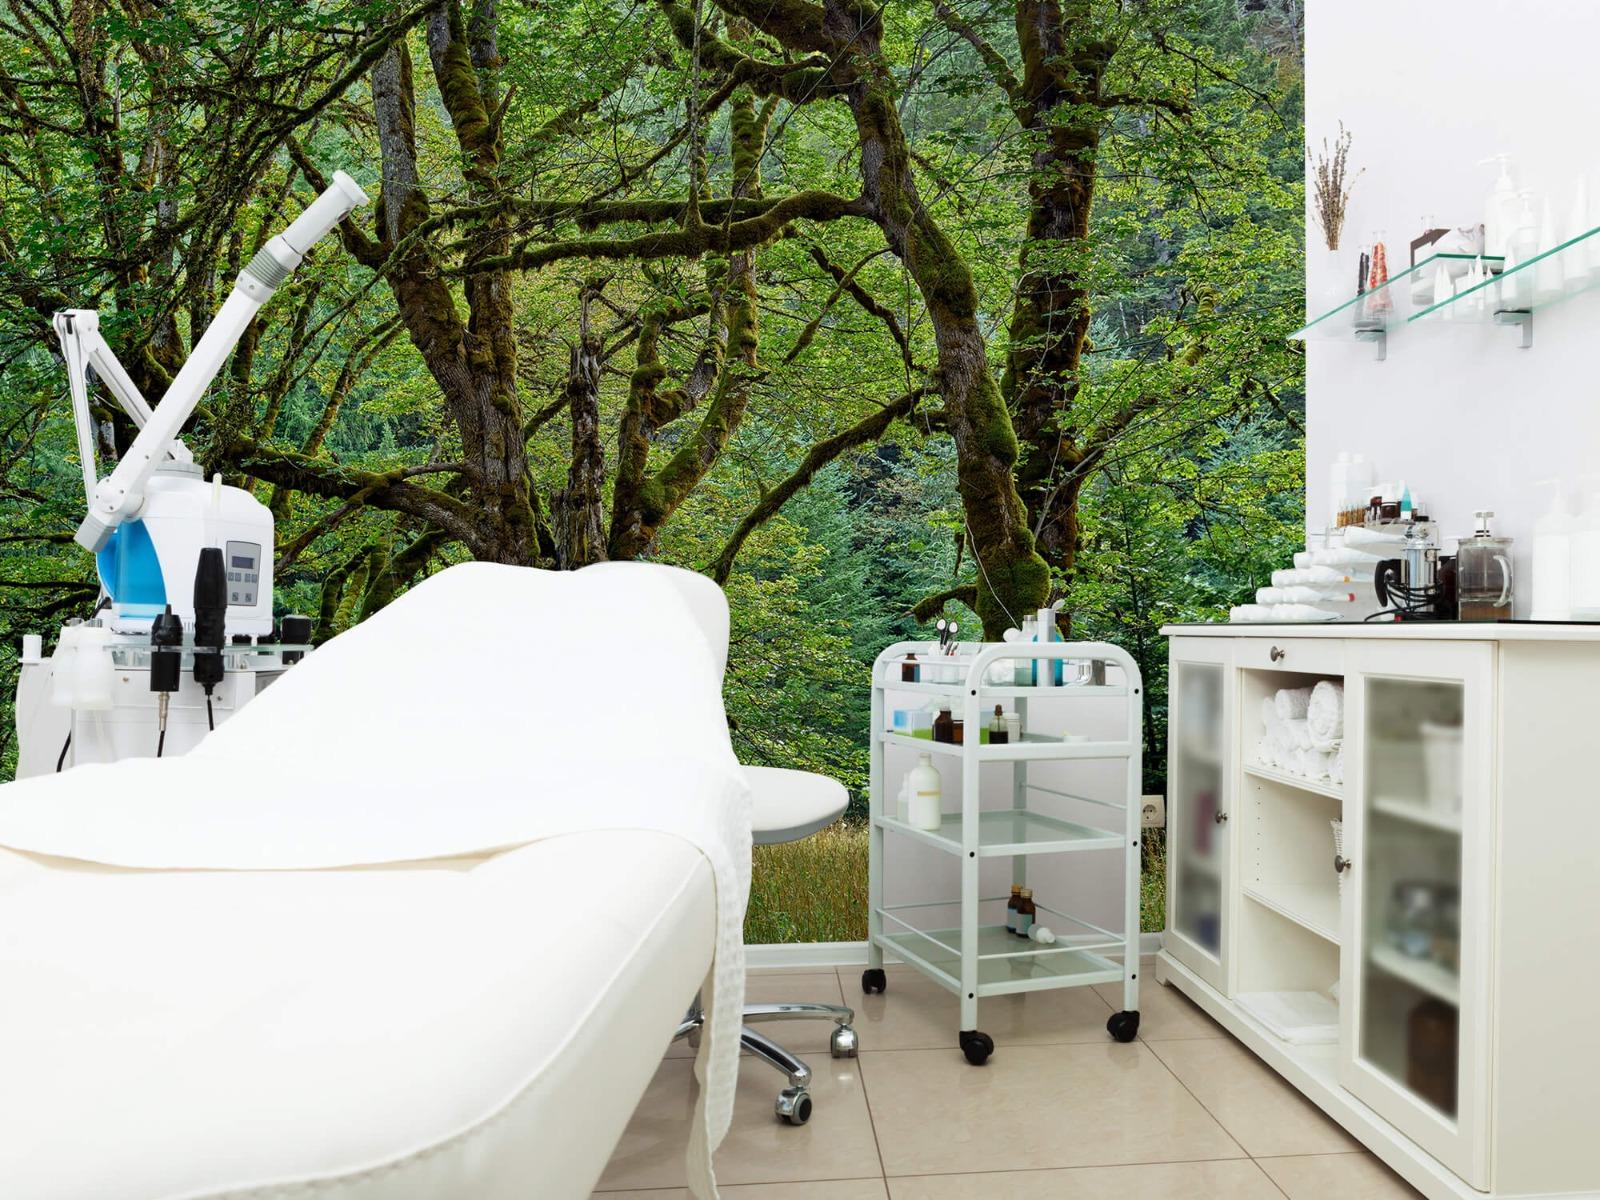 Bomen - Oude bomen - Wallexclusive - Slaapkamer 5